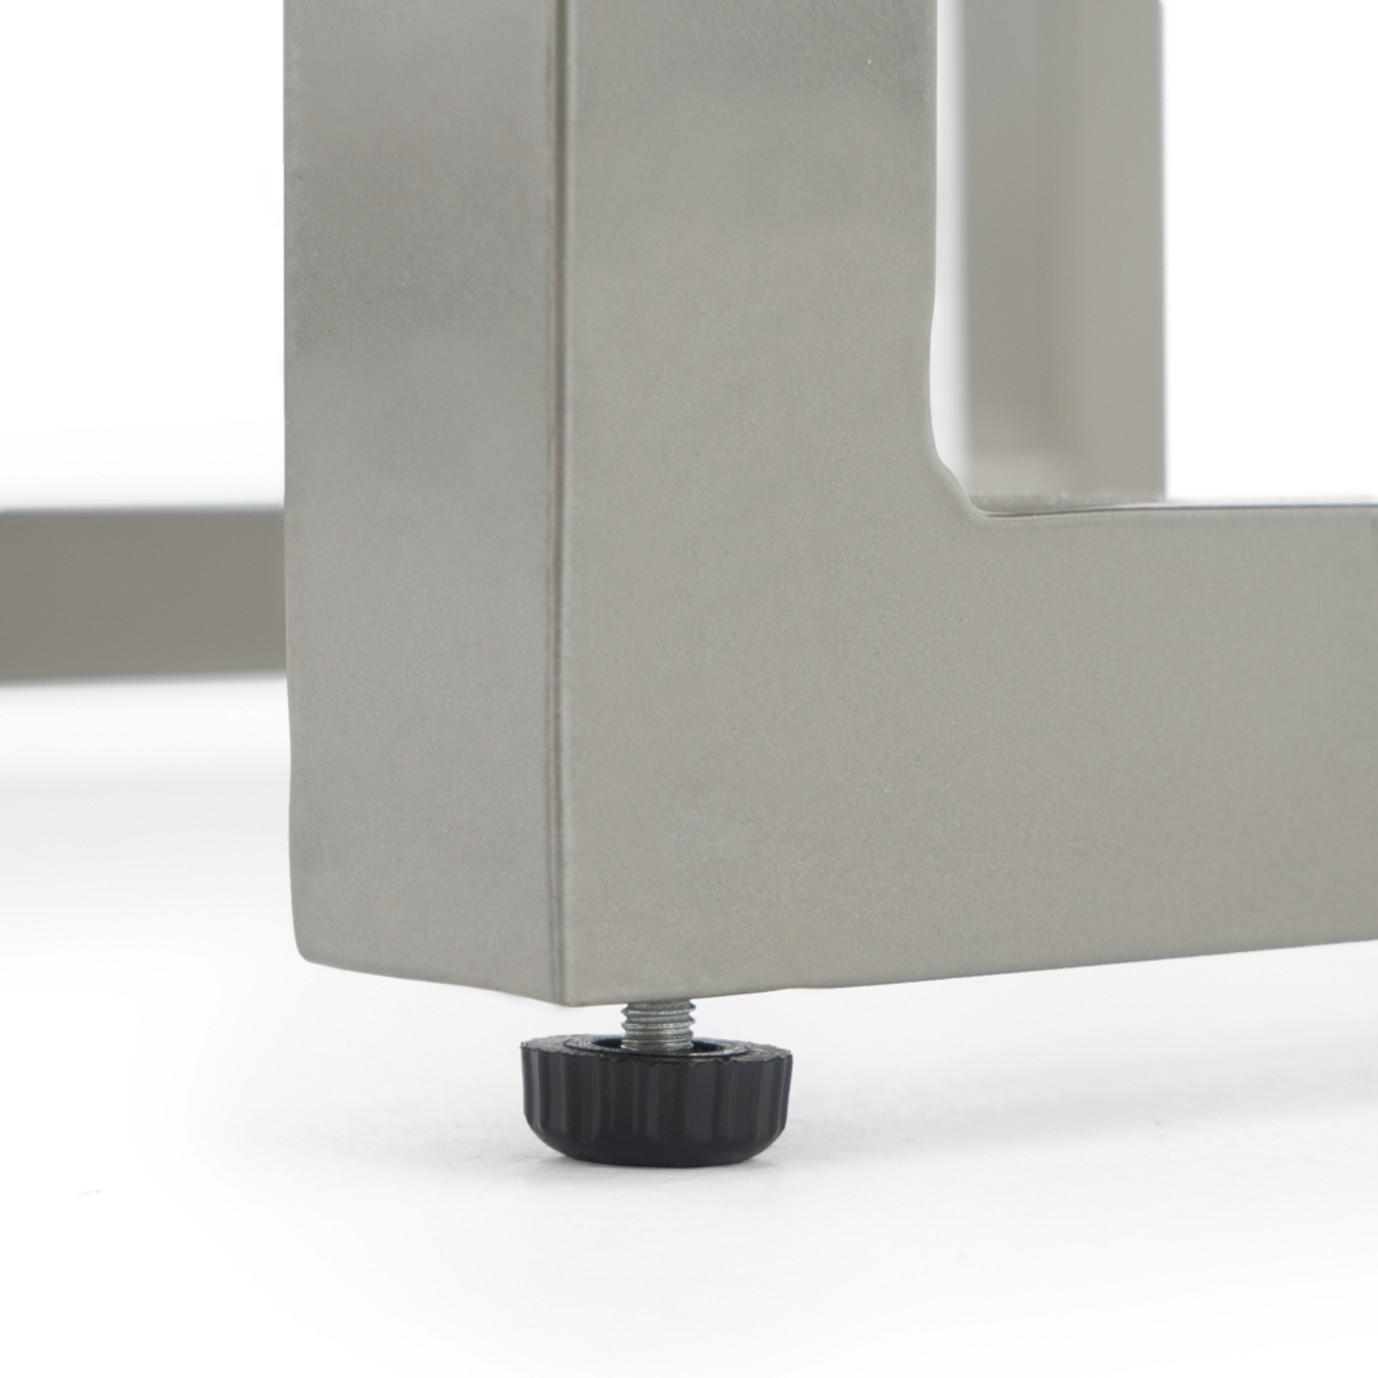 Milo™ Espresso Chaise Lounges - Slate Gray